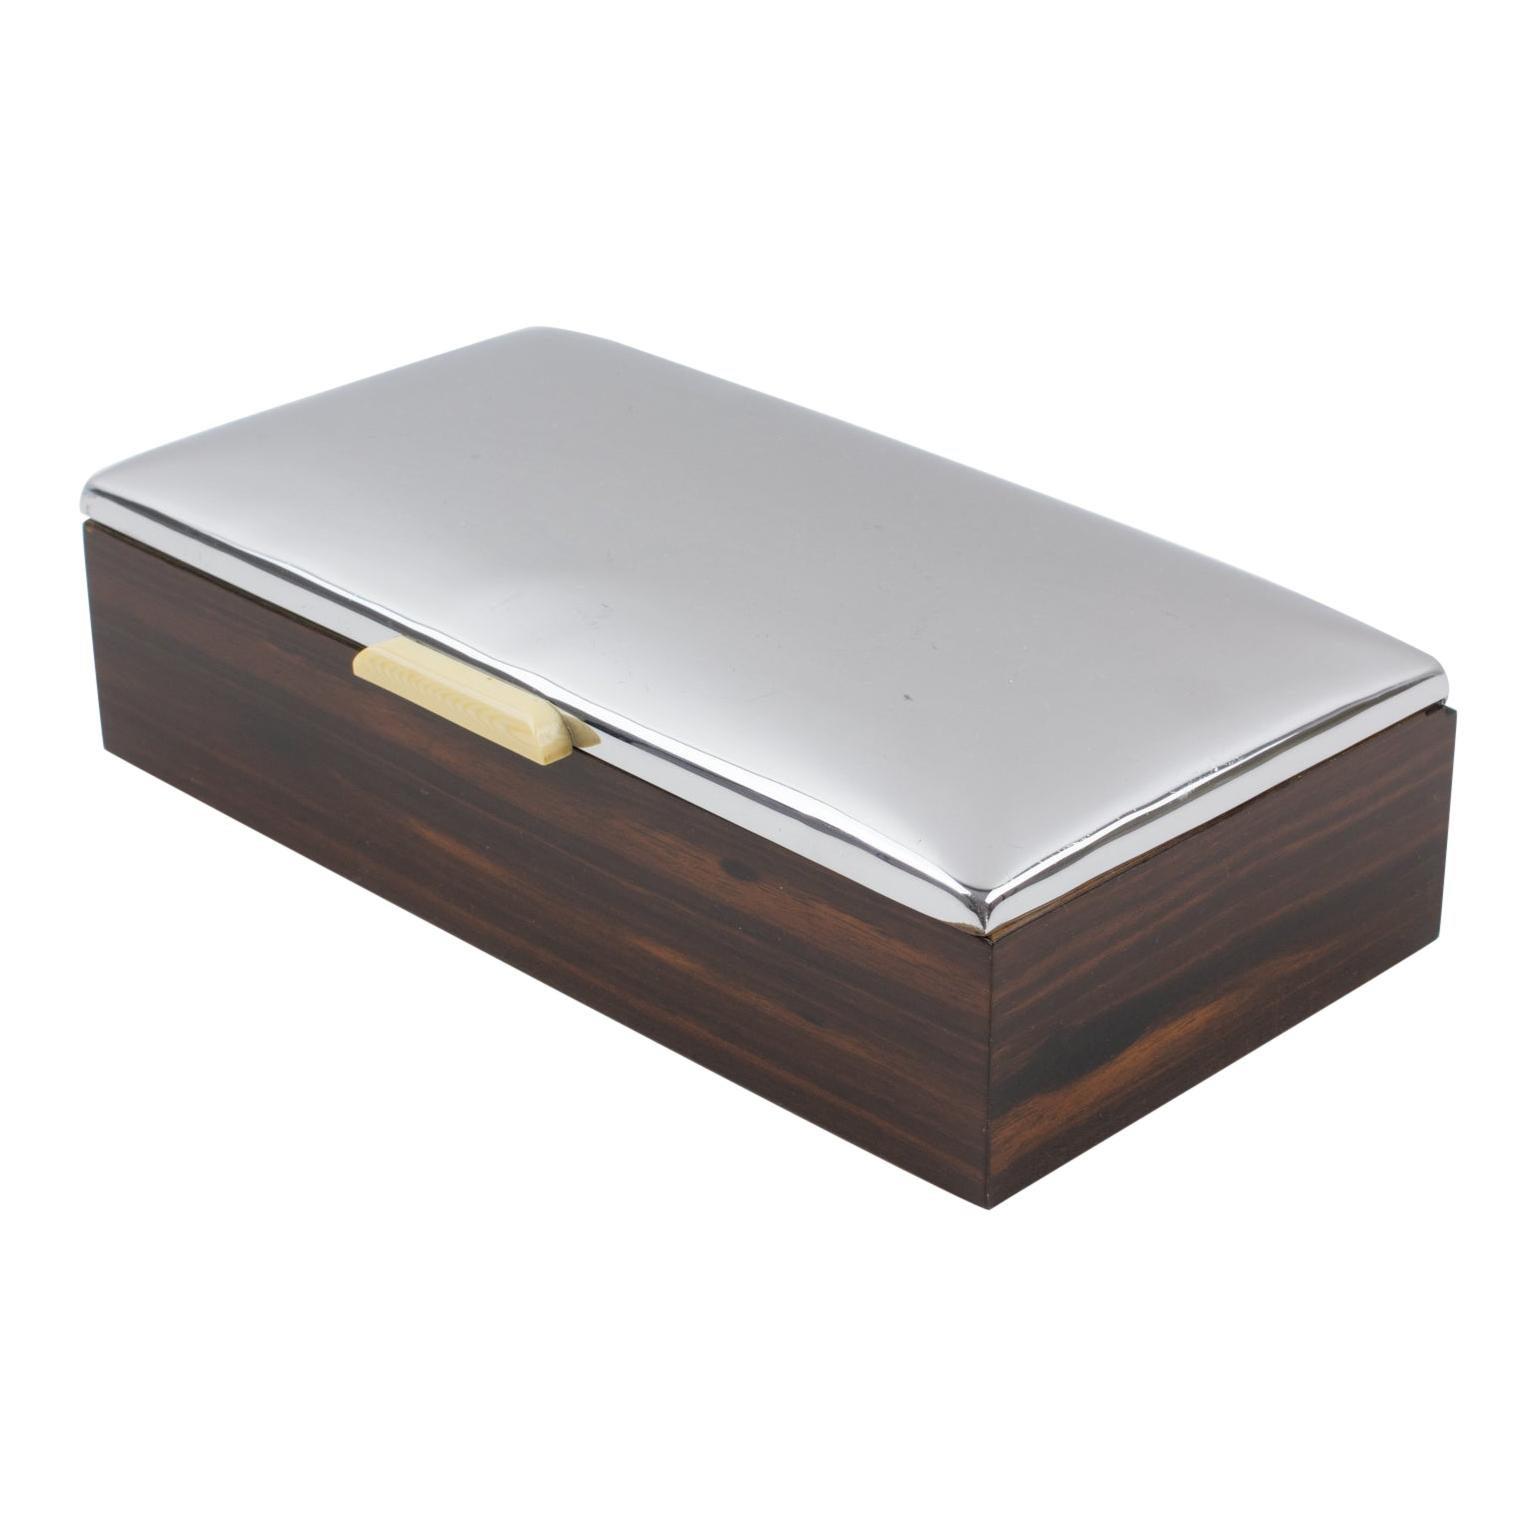 Art Deco 1930s Macassar Wood and Chrome Box